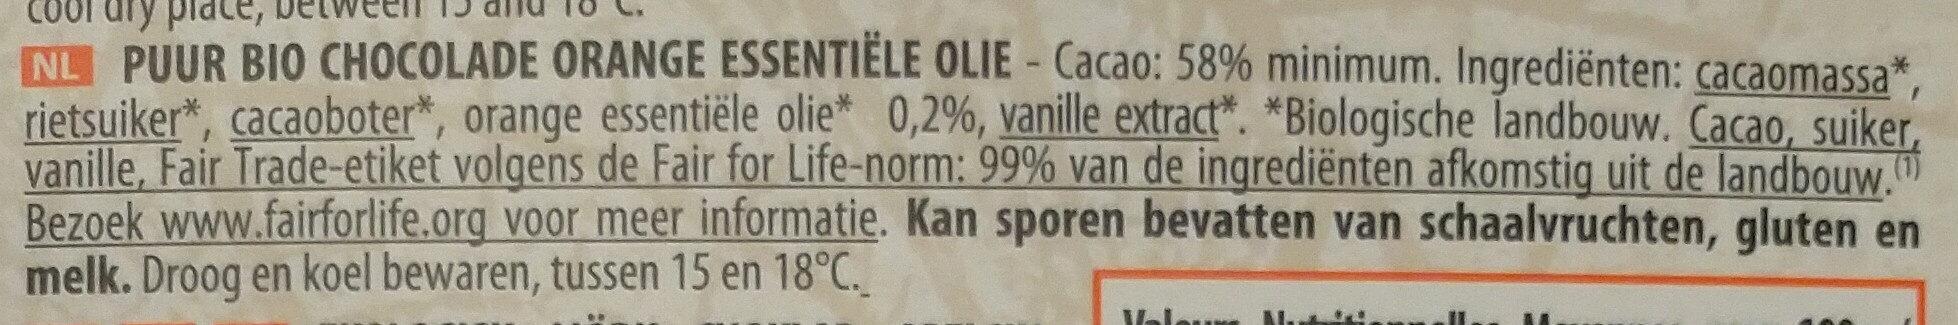 Chocolat noir huile essentielle orange - Ingrediënten - nl